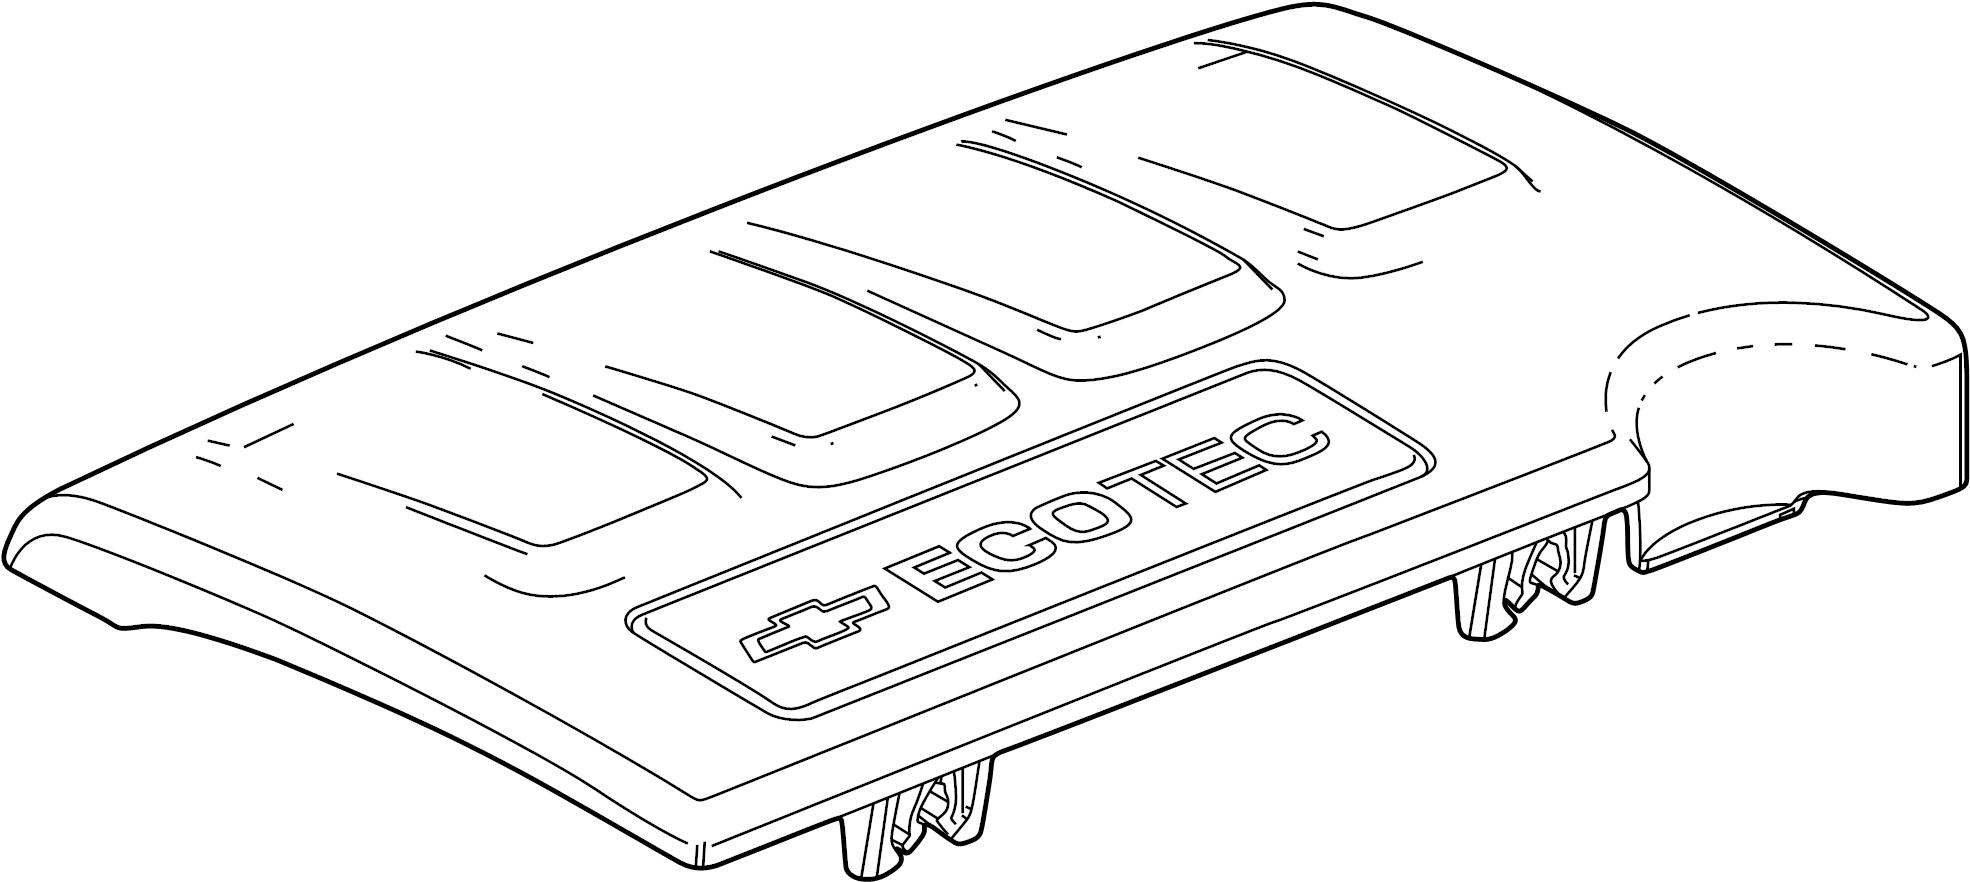 2011 dodge avenger 2.4 fuse box diagram